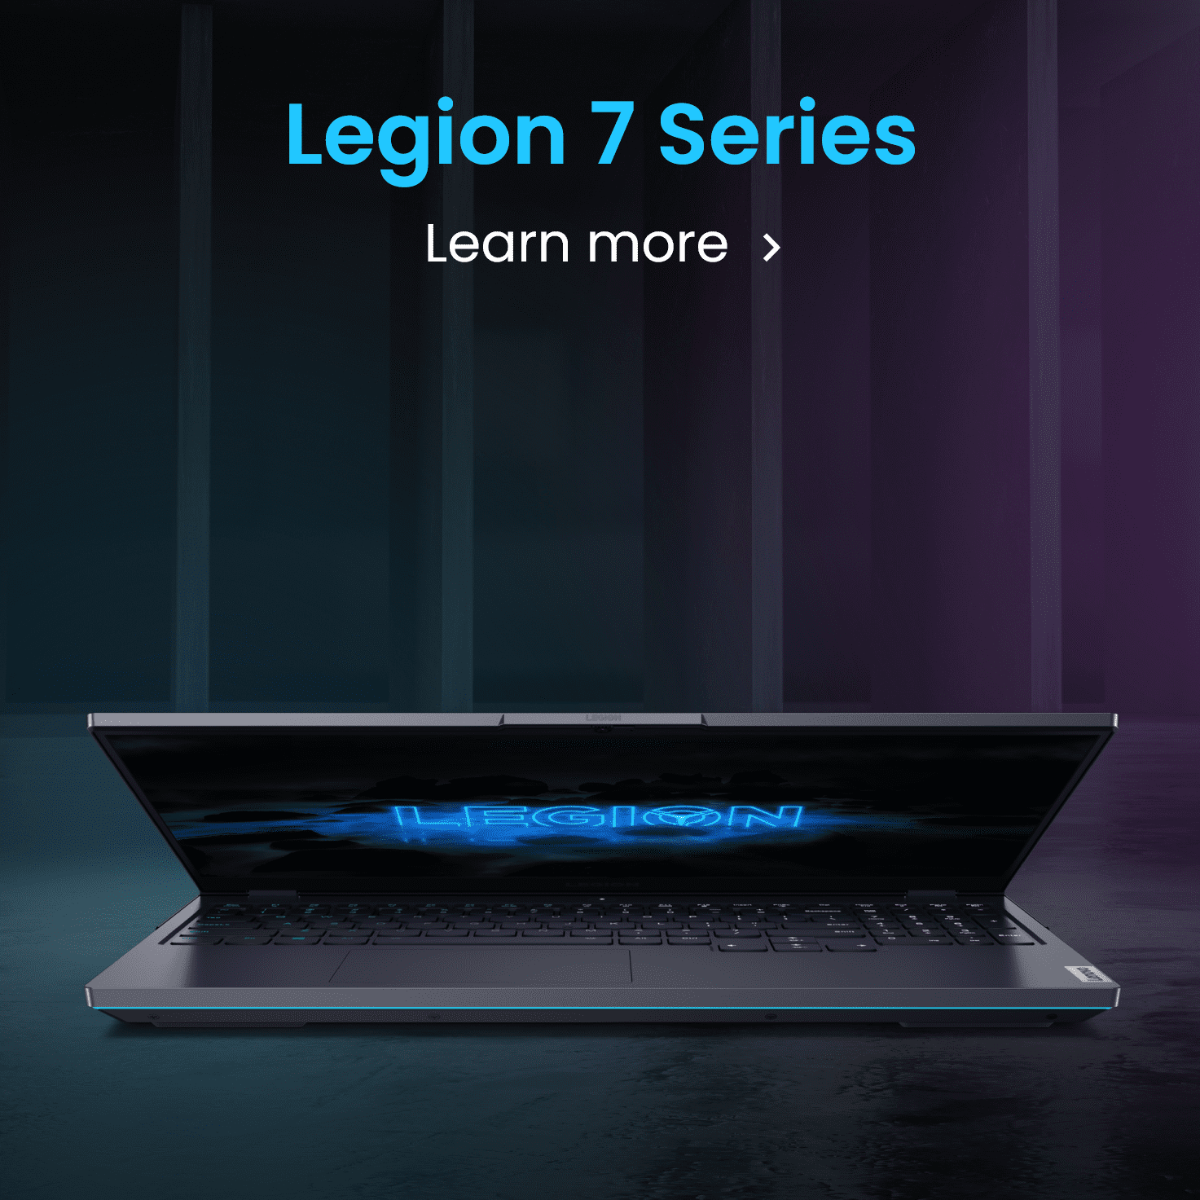 Legion 7 Series